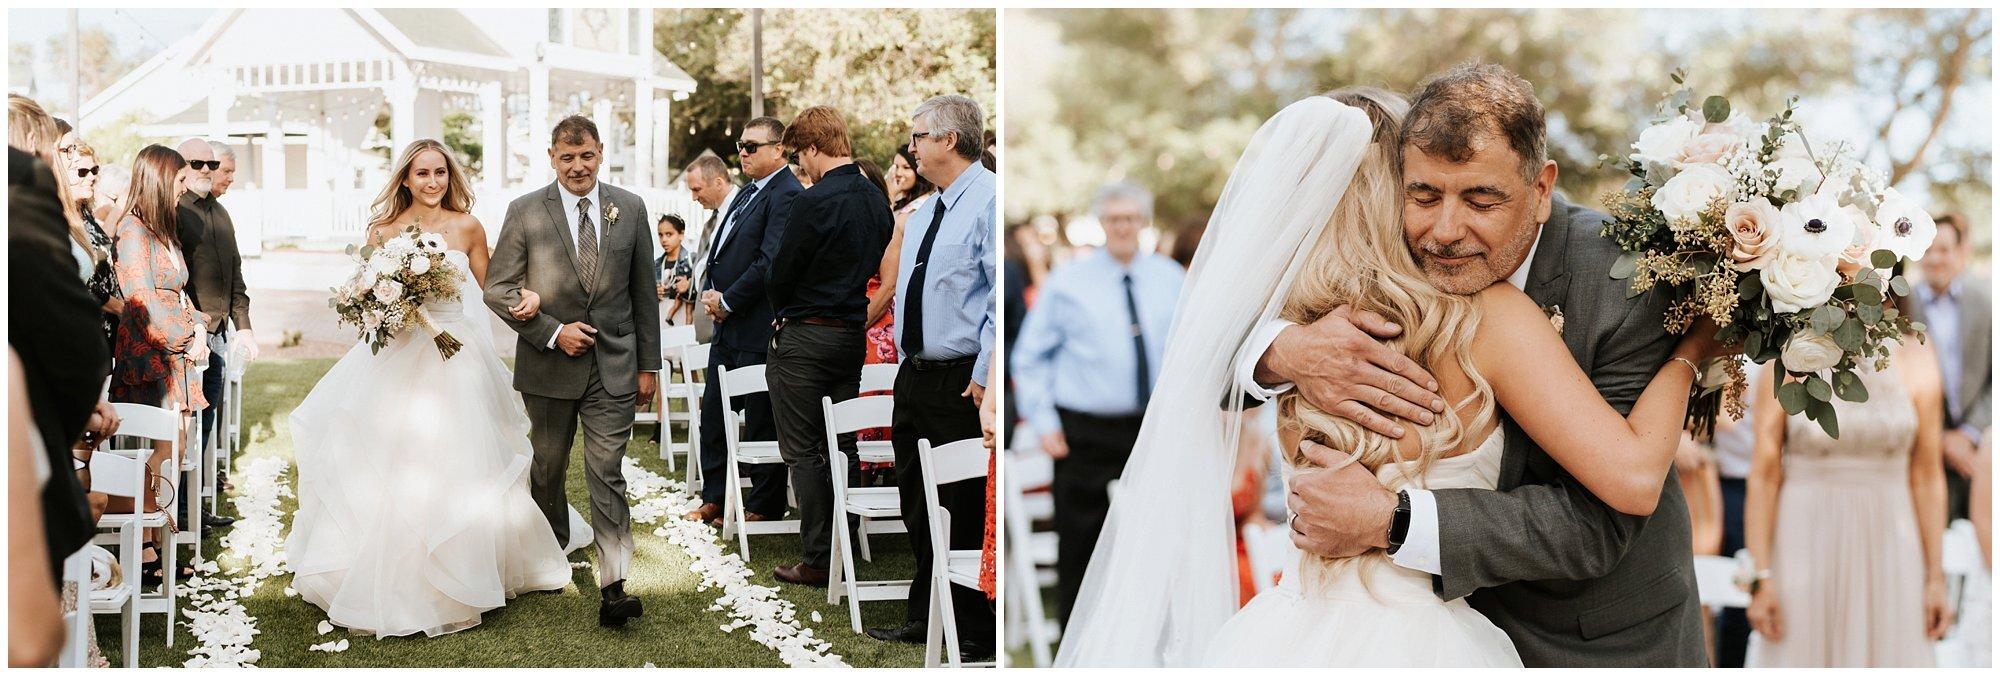 Wedgewood_Lindsay_Groves-Arizona-Wedding-Photographer-M+C_0025.jpg